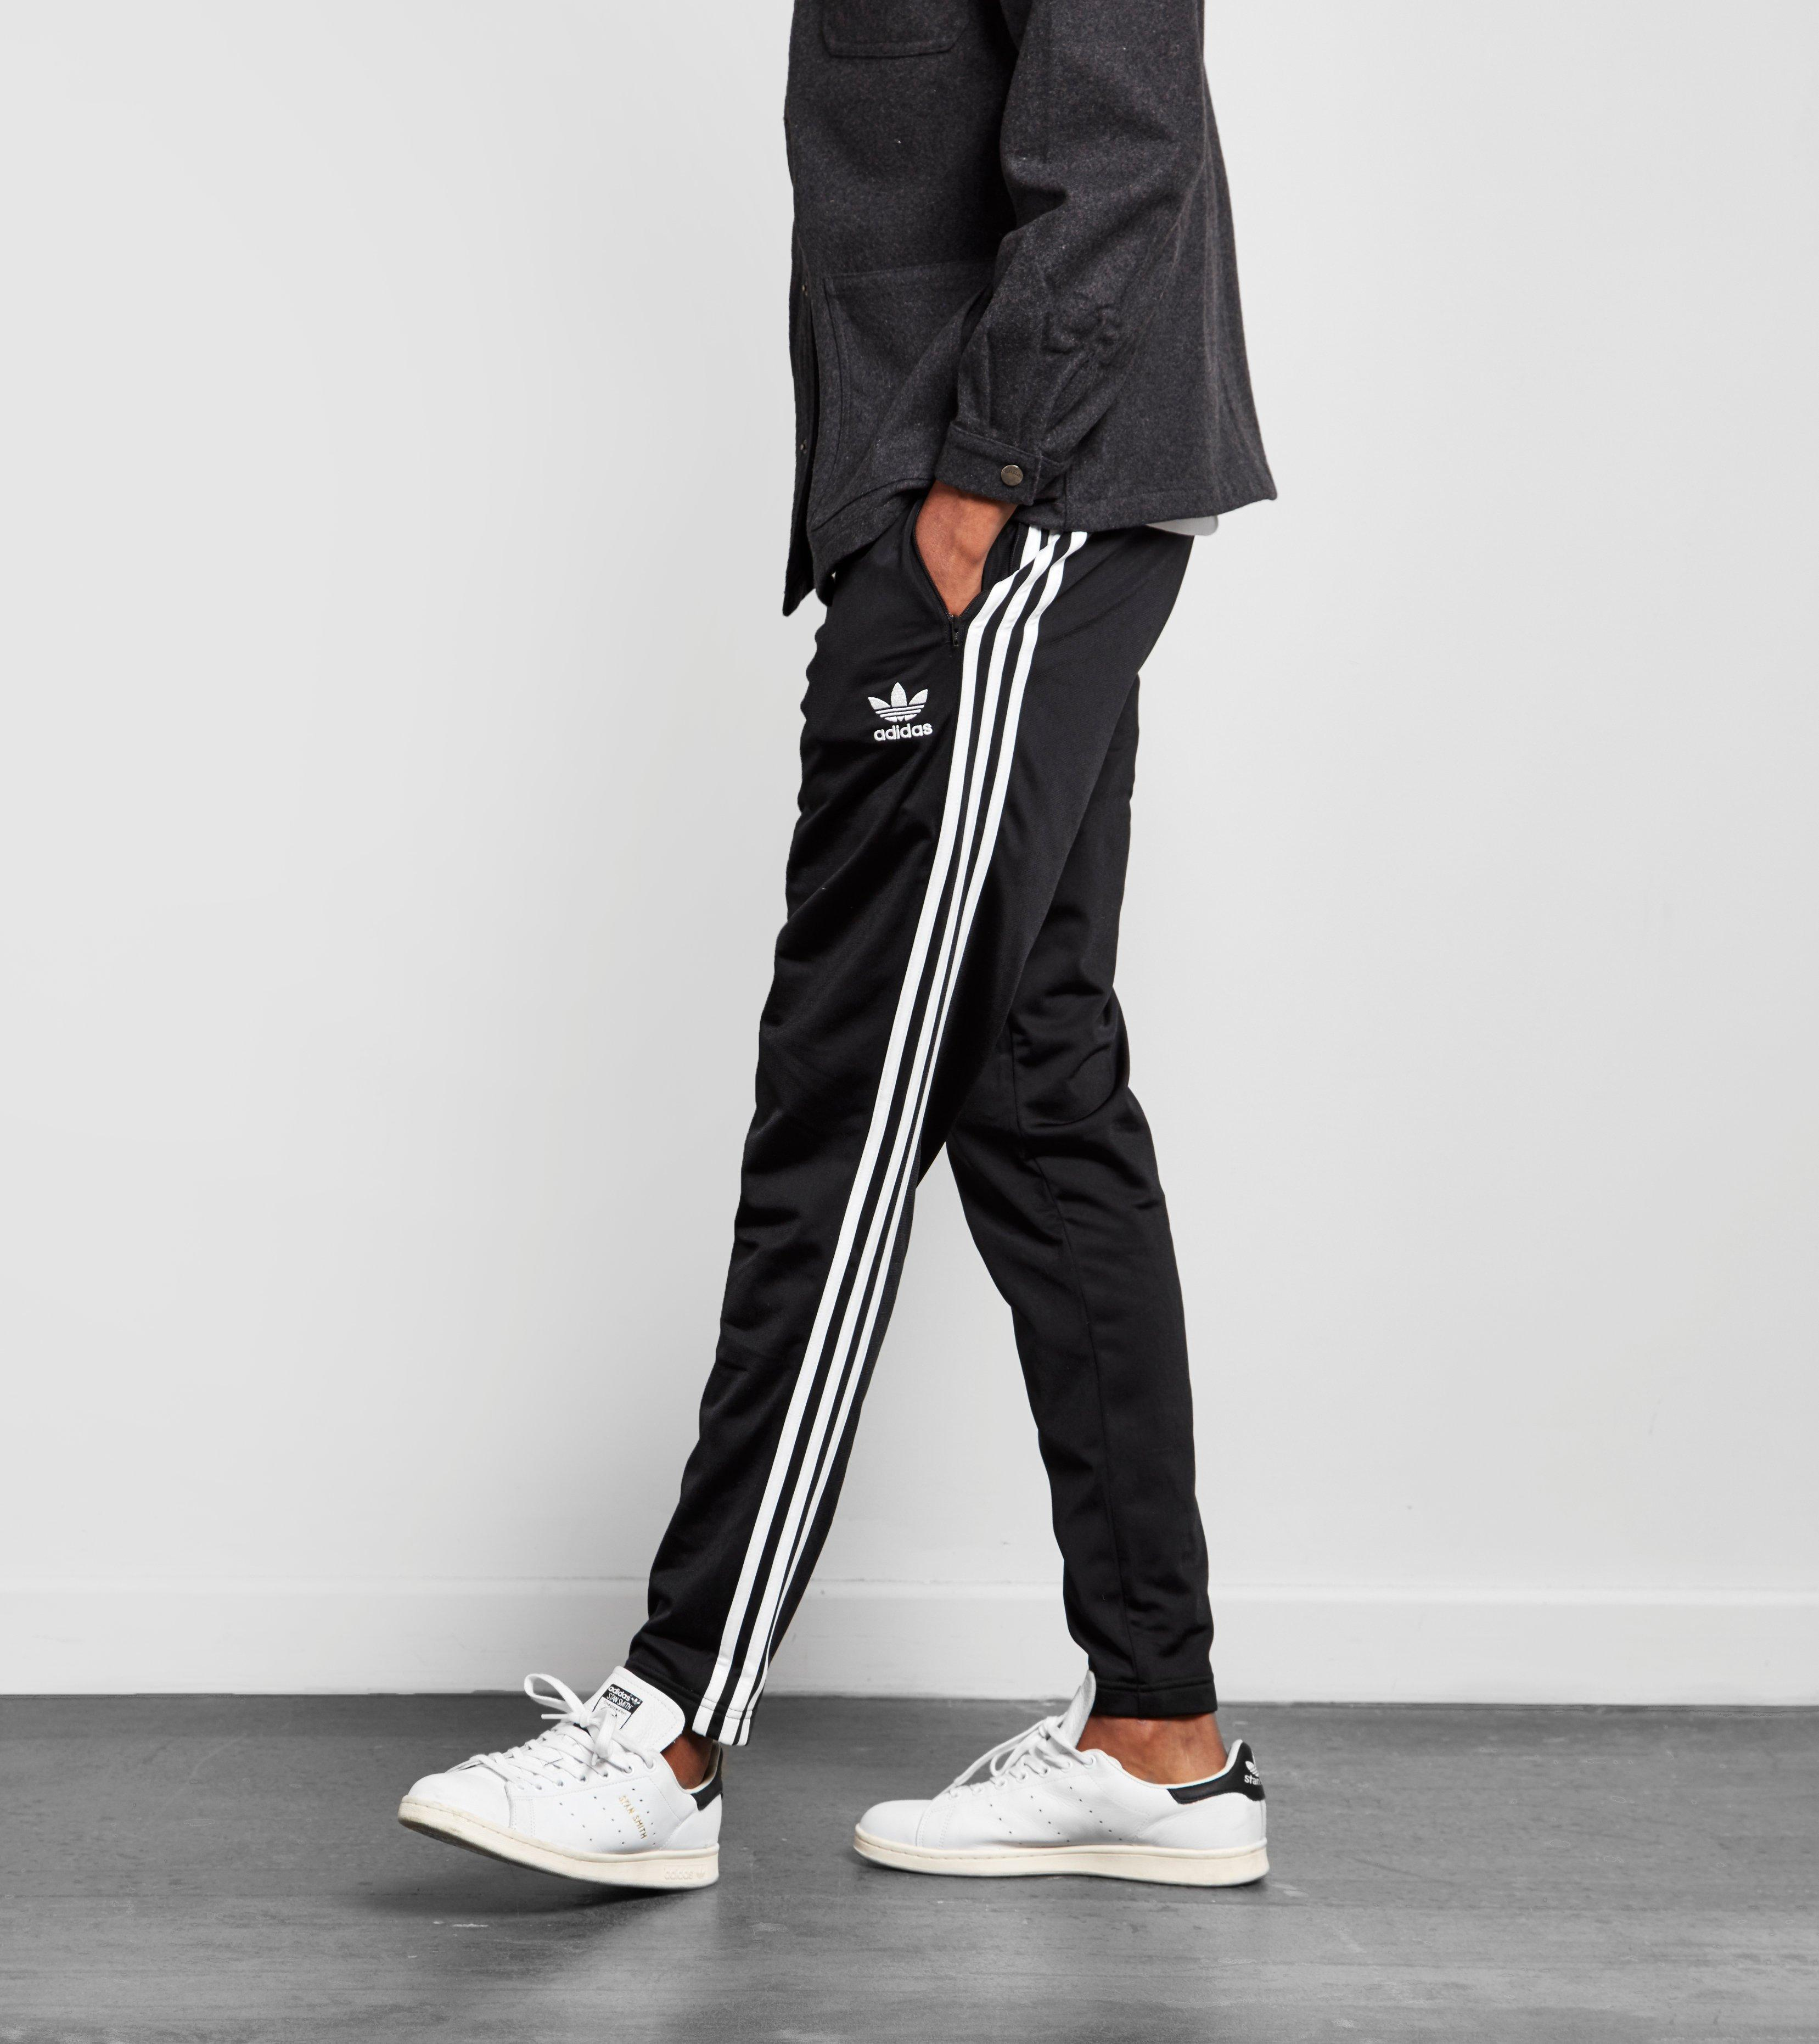 eacae297d Lyst - adidas Originals Superstar Taper Track Pants in Black for Men